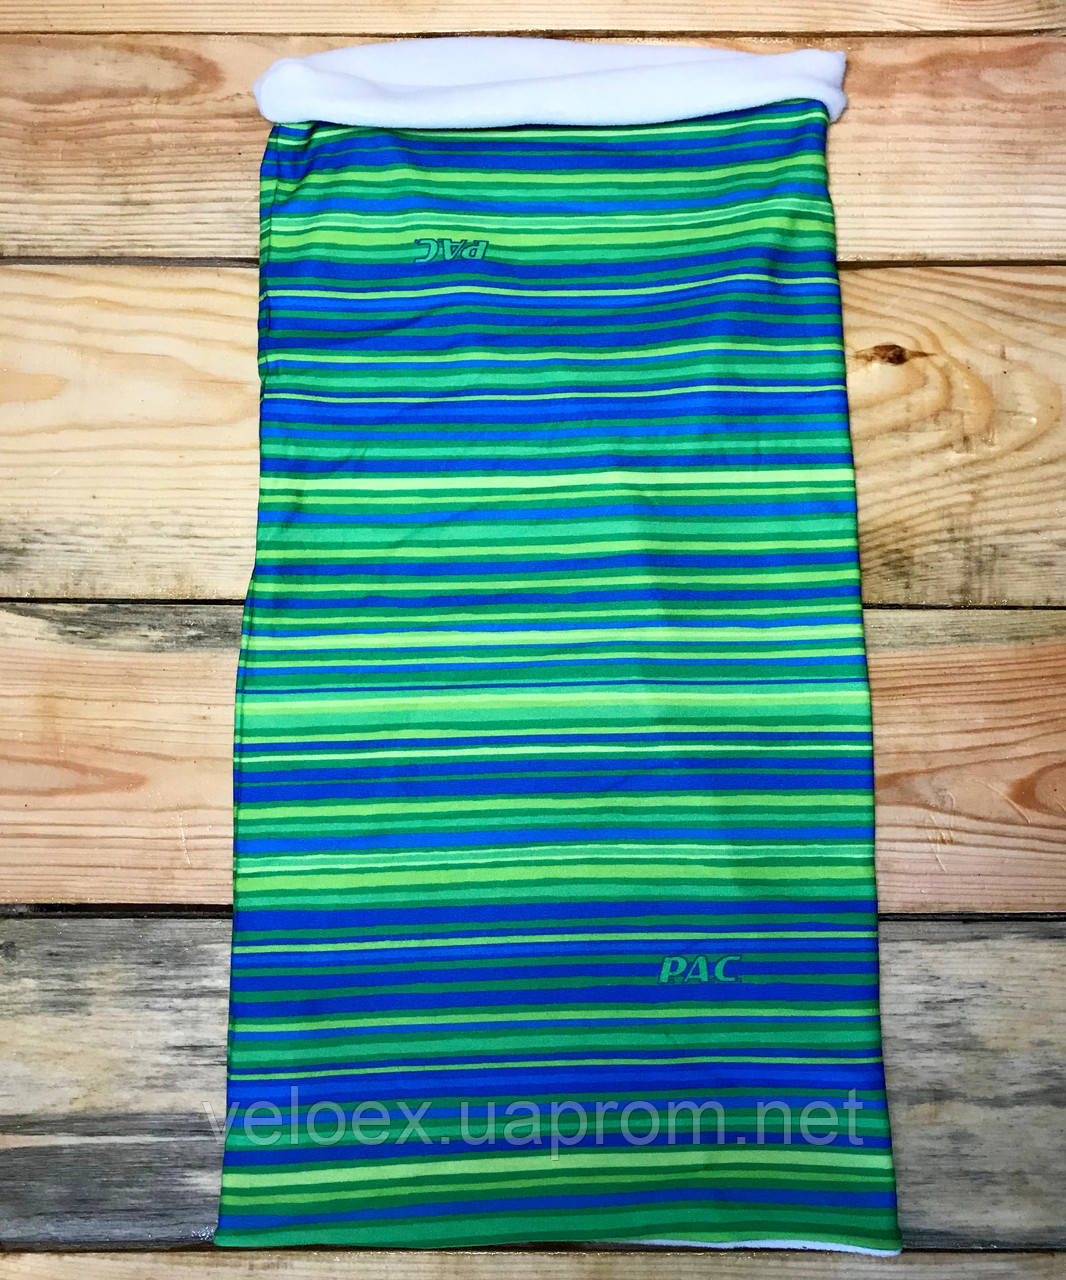 Головной убор P.A.C. Twisted Fleece All Stripes Lime